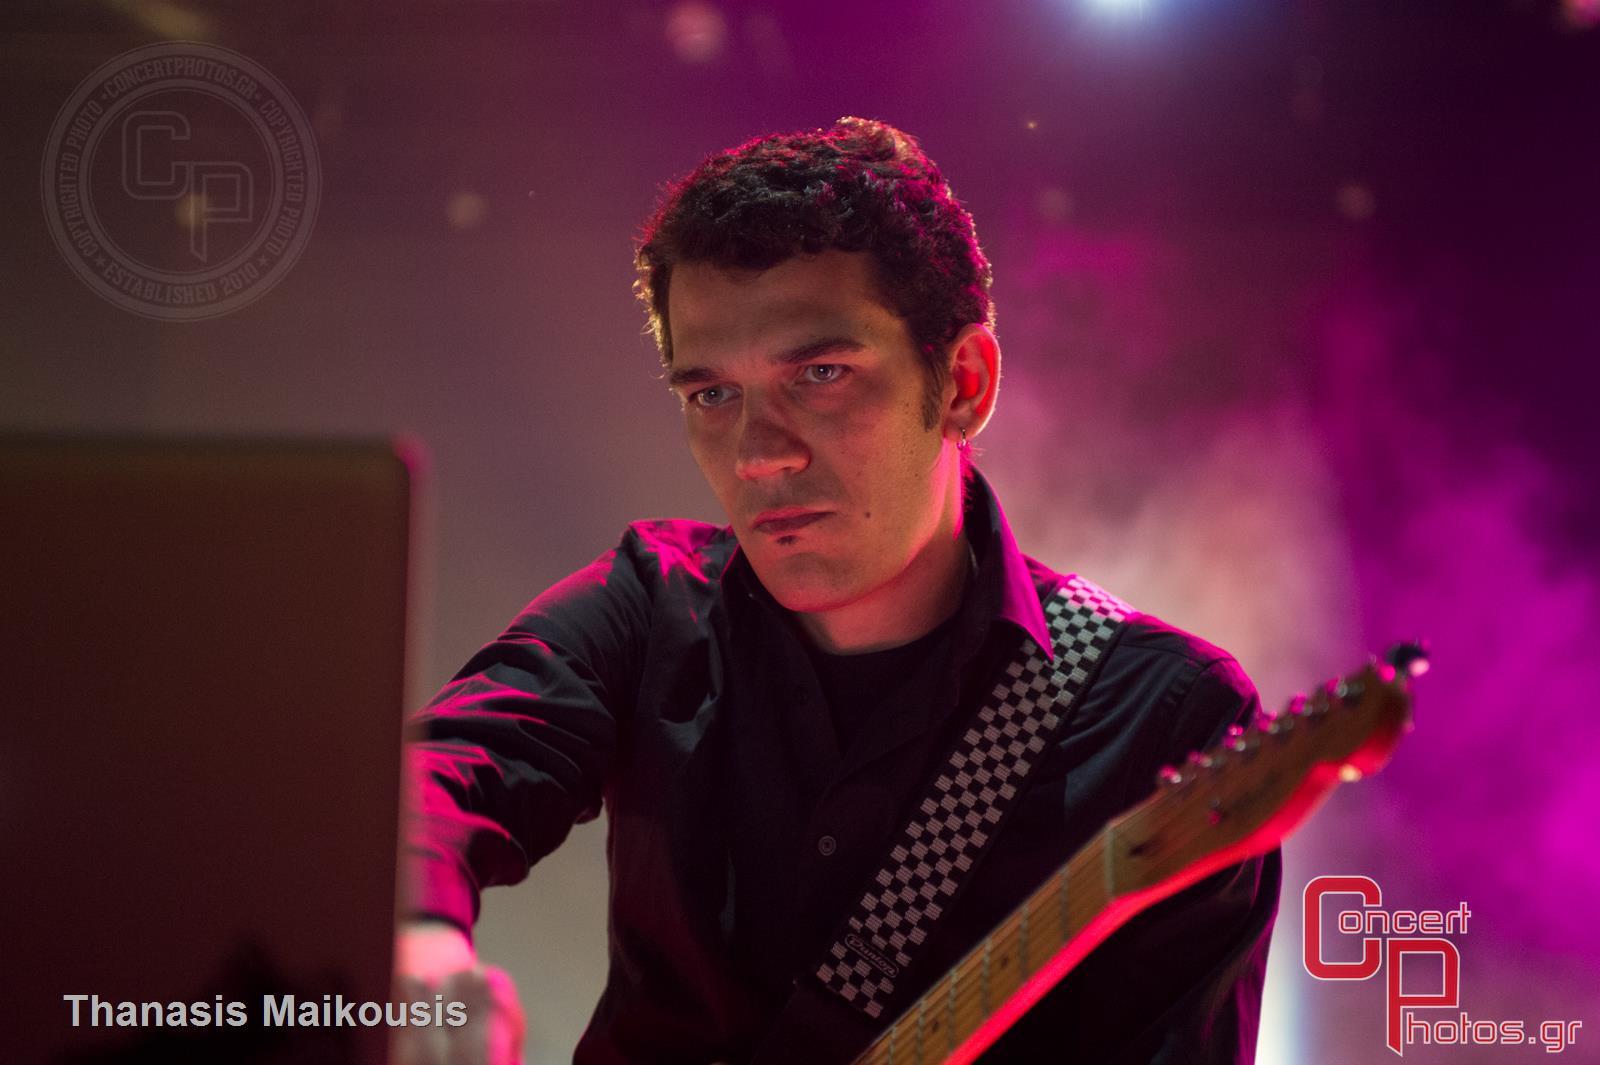 Tricky - Spectralfire-Tricky - Spectralfire photographer: Thanasis Maikousis - concertphotos_-3478